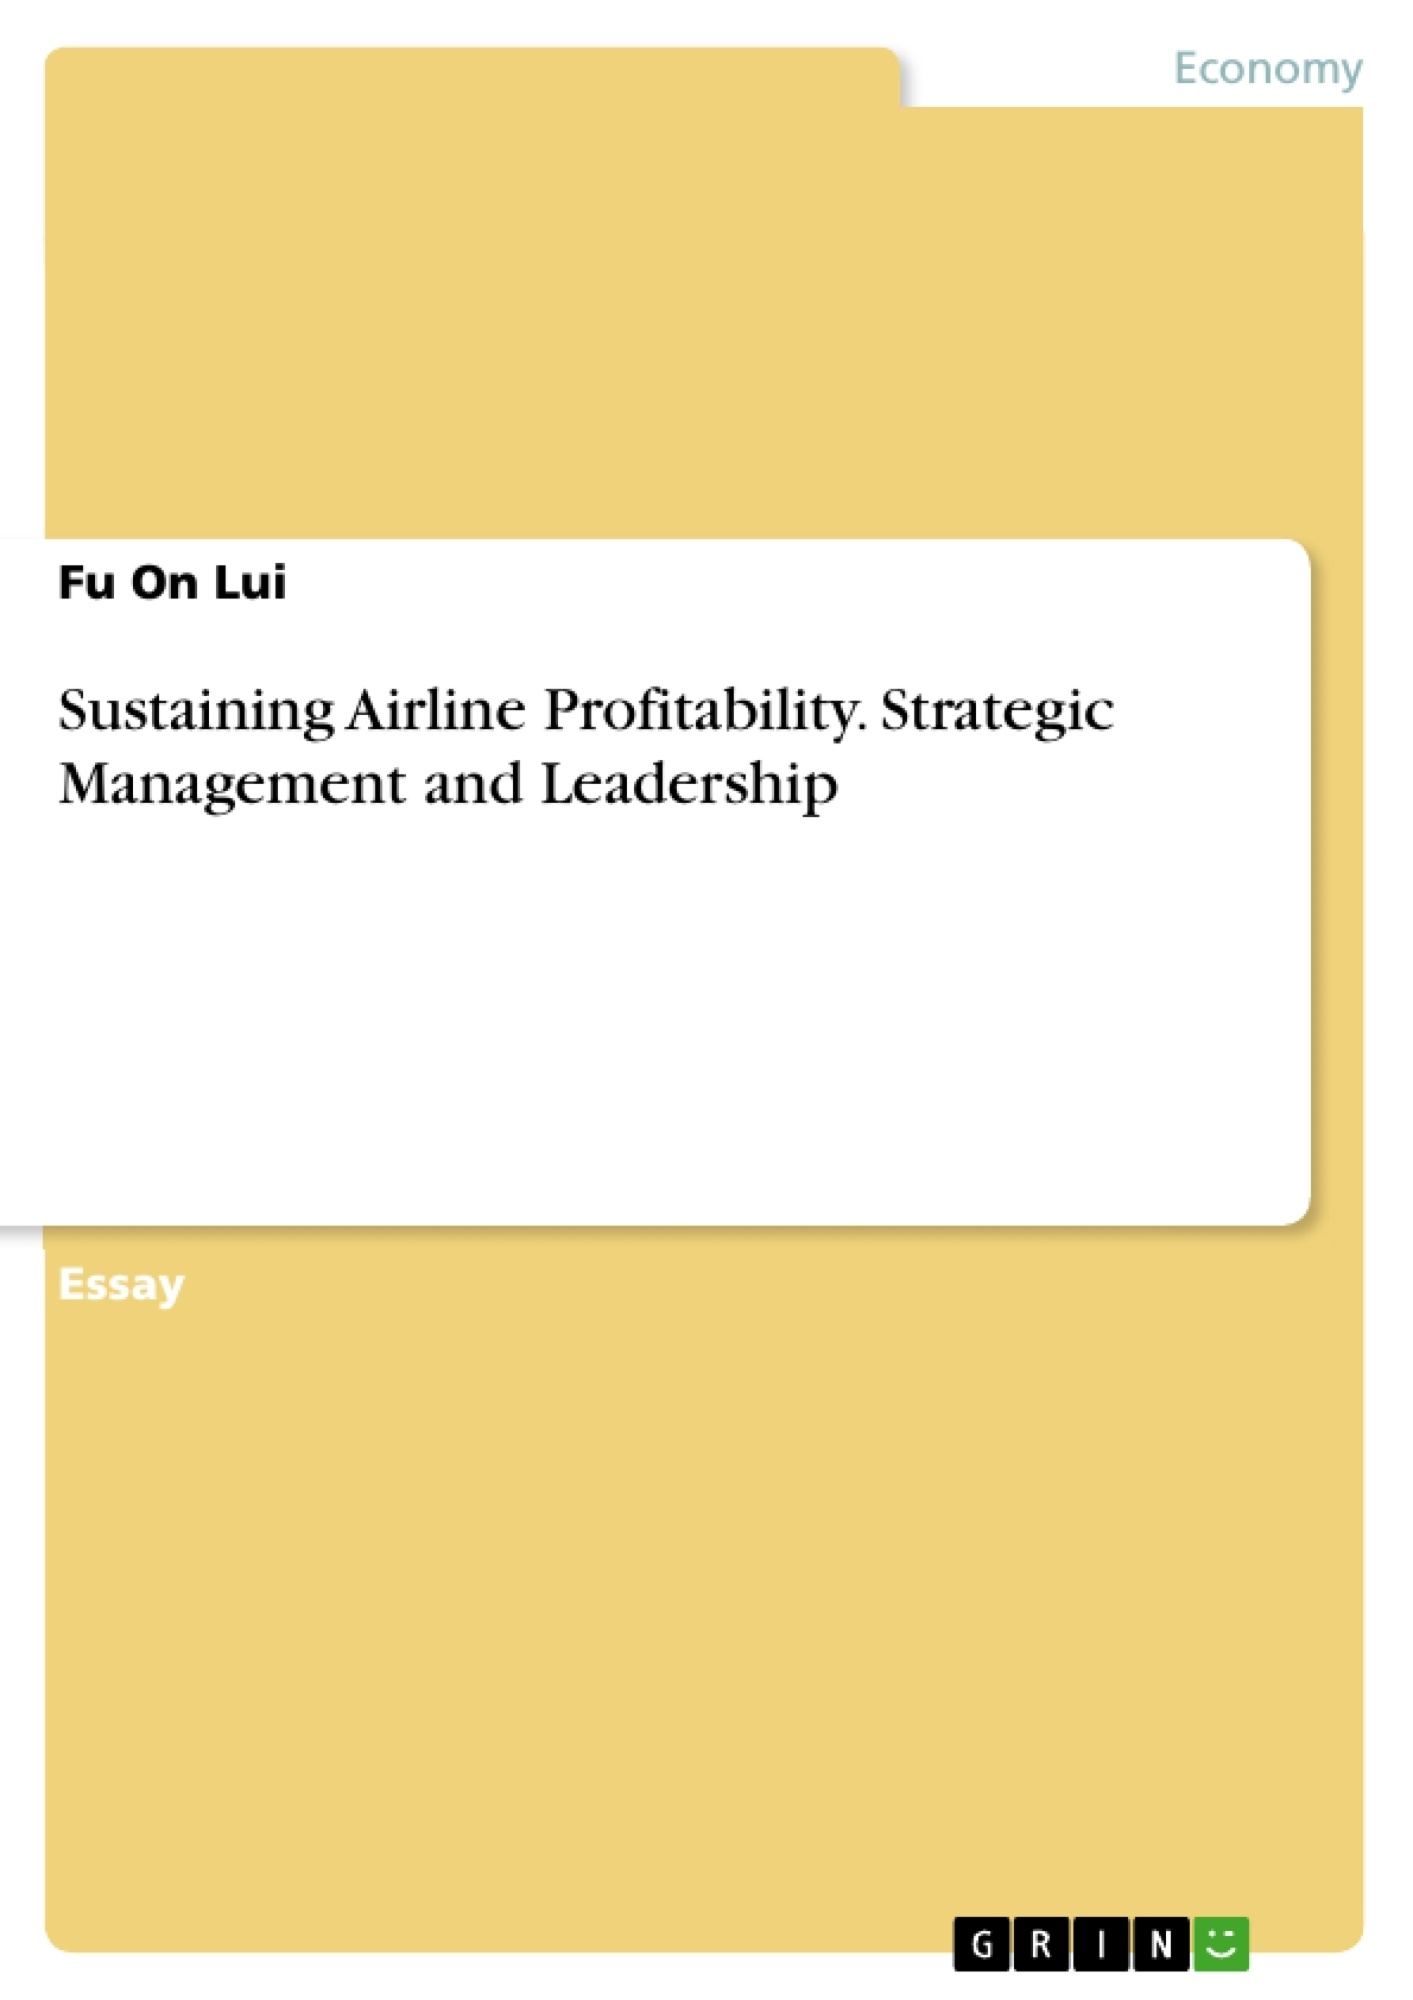 Title: Sustaining Airline Profitability. Strategic Management and Leadership